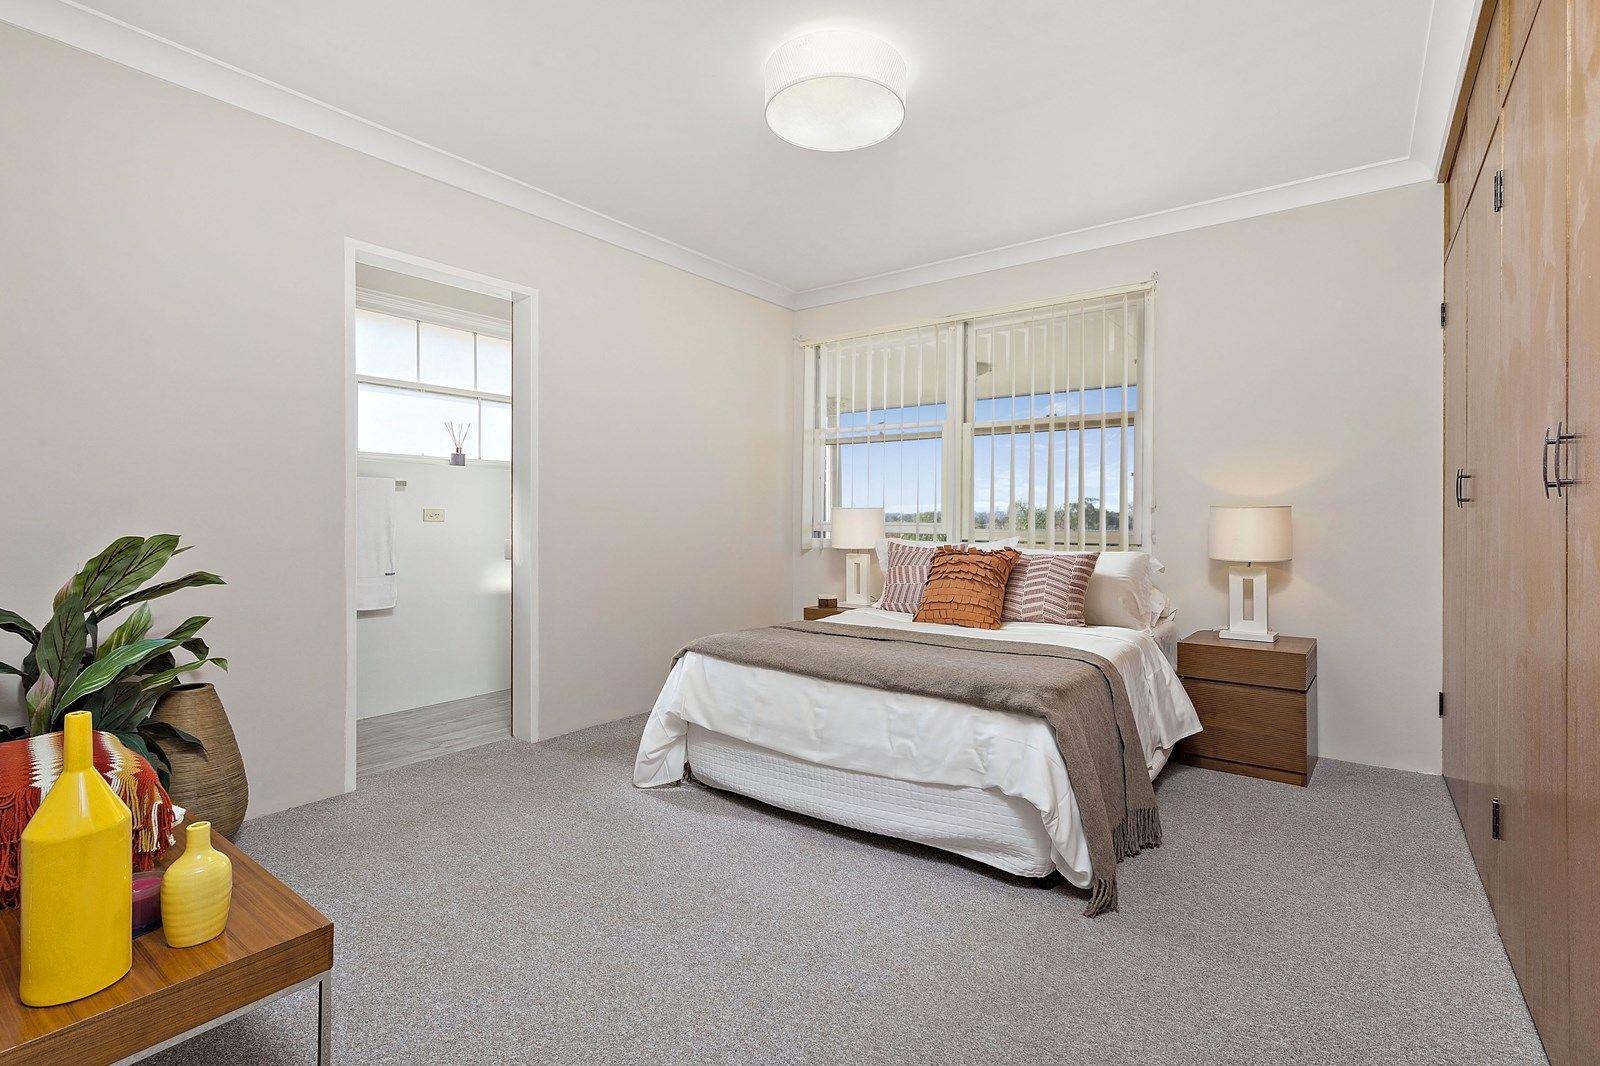 15/44 Chandos Street, Ashfield NSW 2131, Image 2